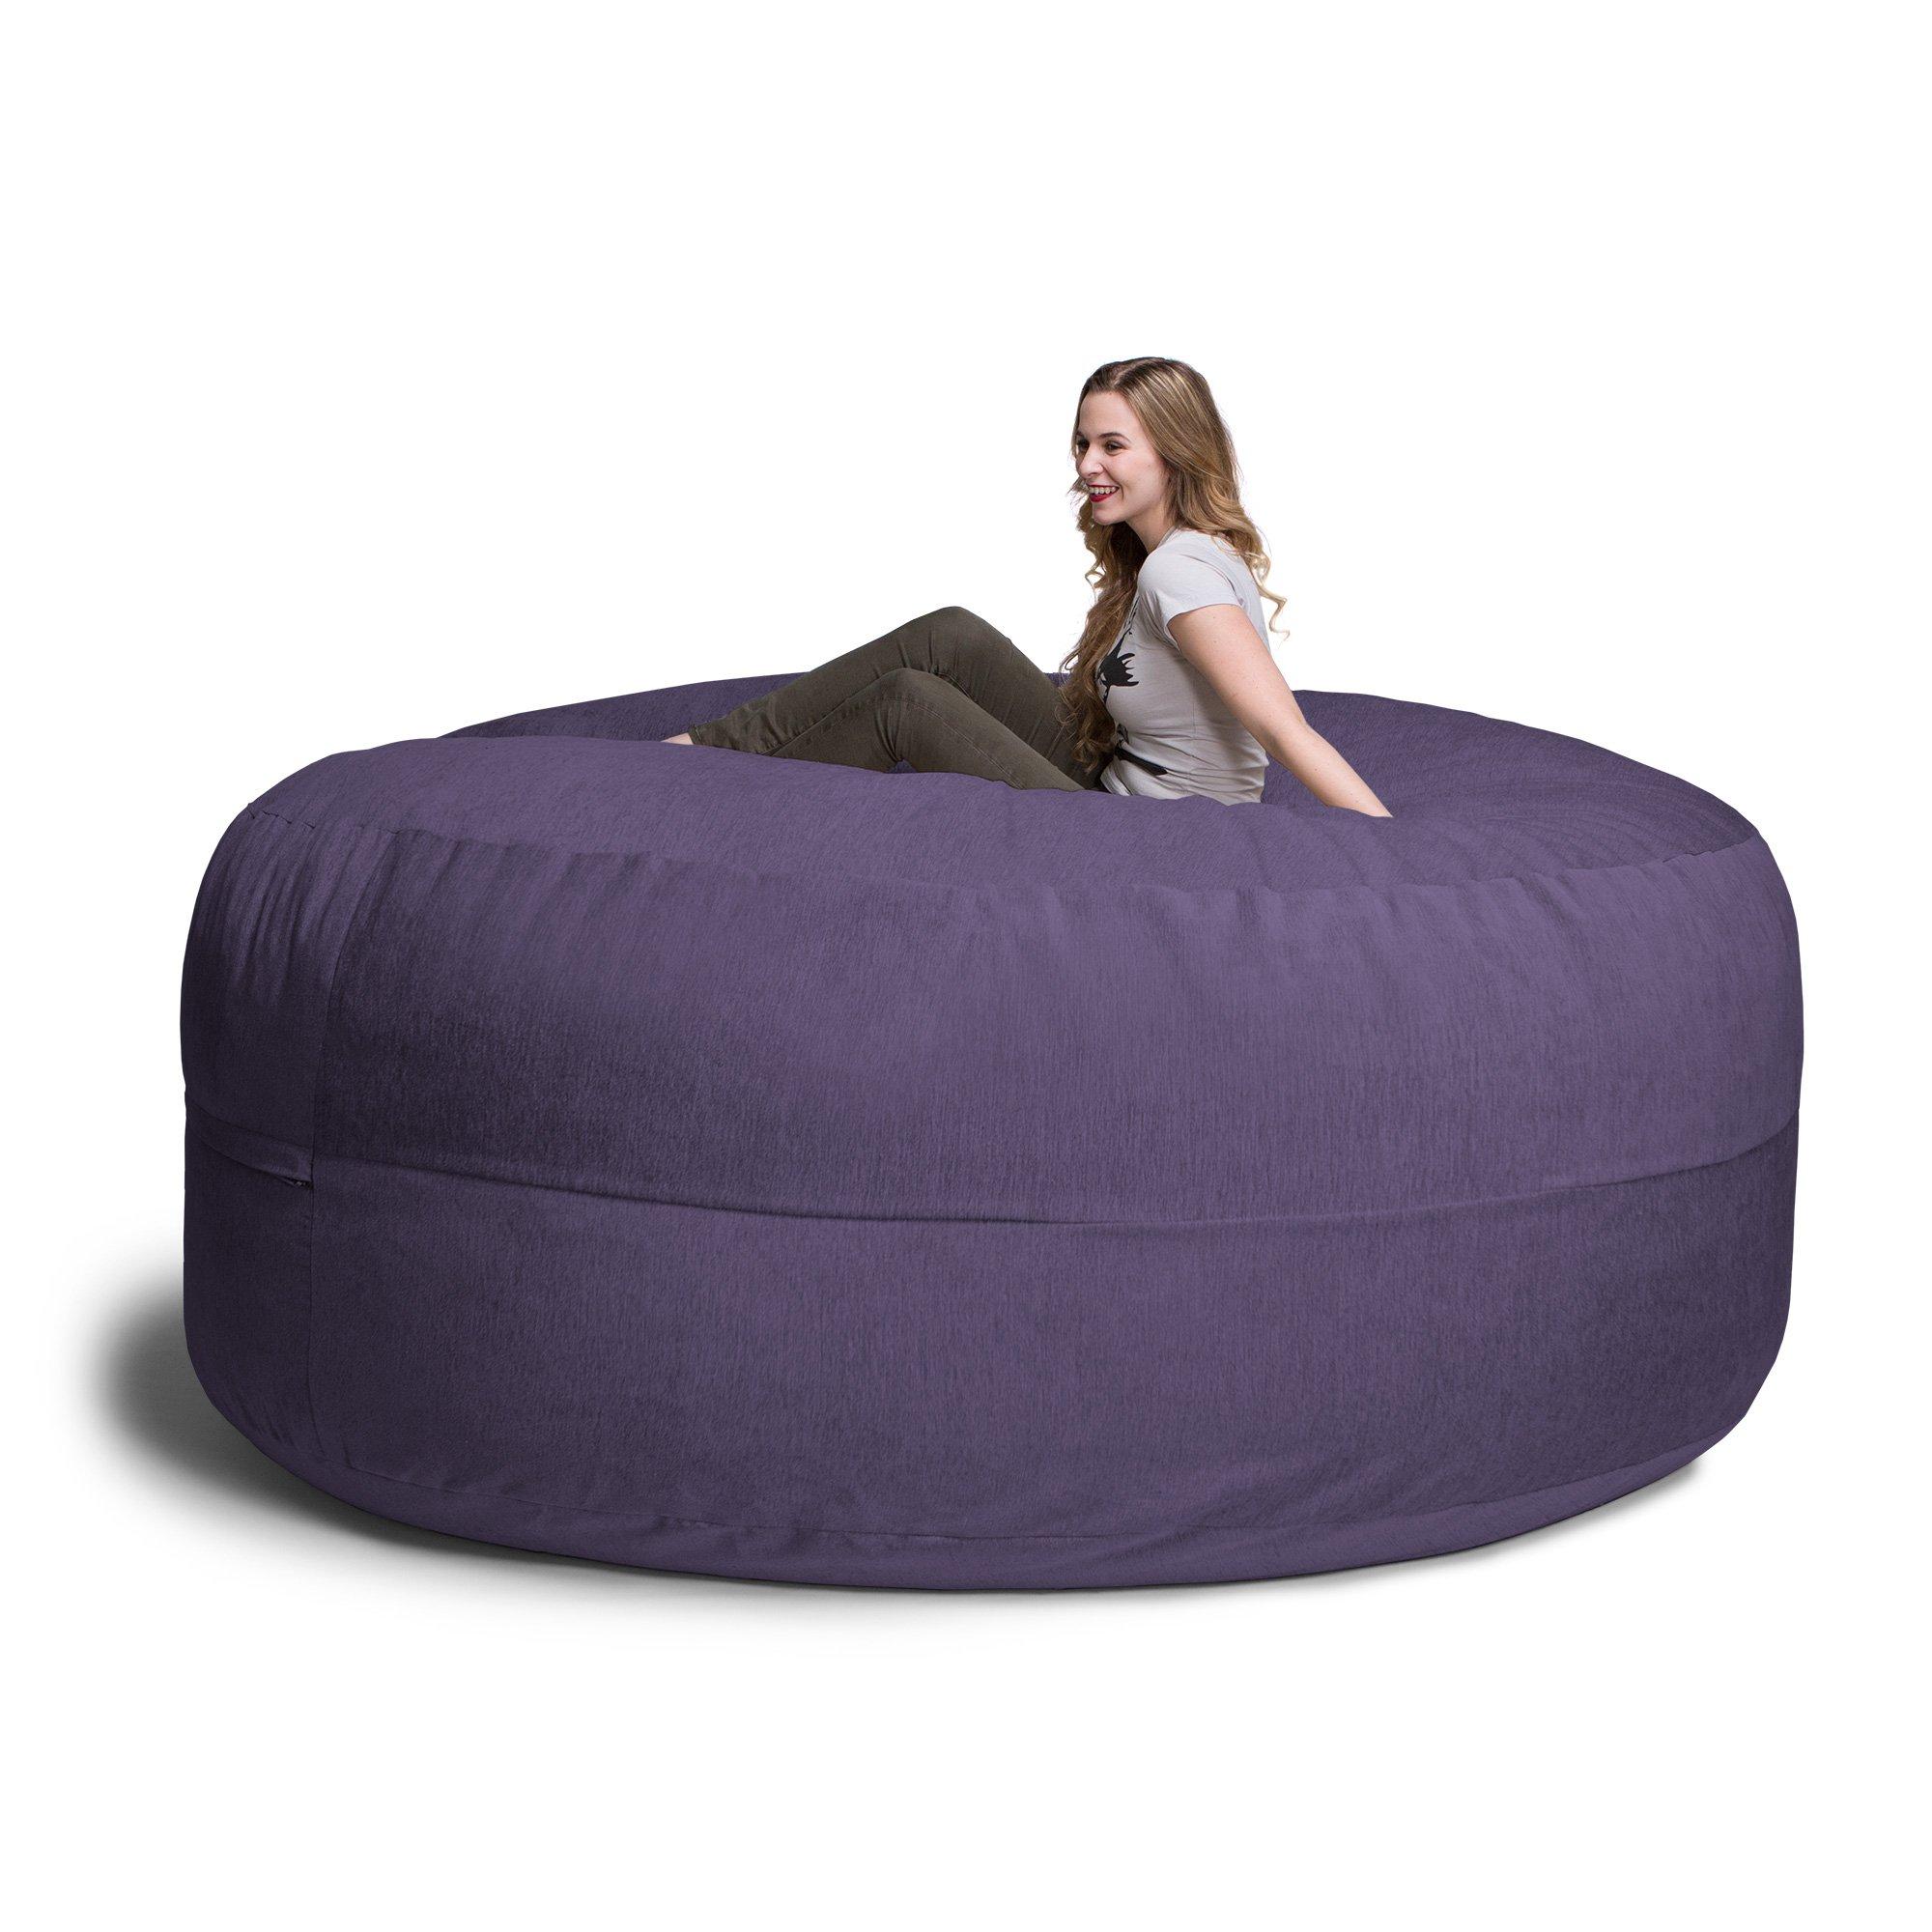 Jaxx Cocoon 8 Foot Huge Sleeper Bean Bag Bed - Chenille, Plum by Jaxx (Image #10)